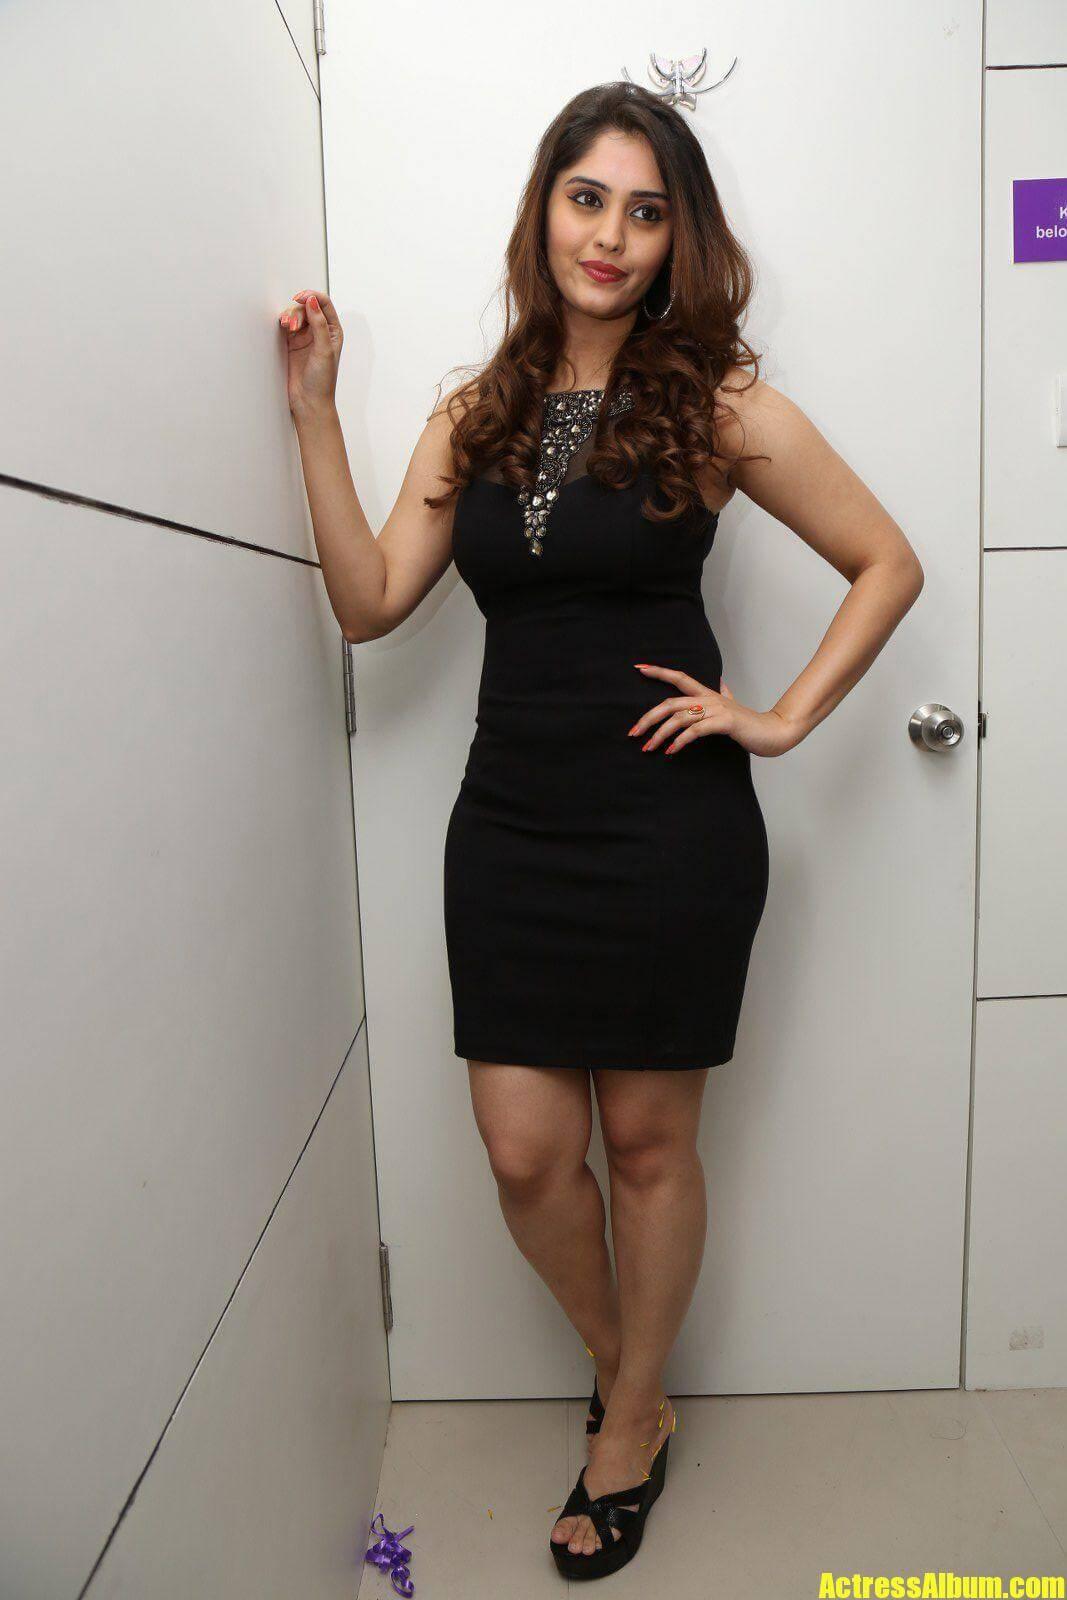 Surabhi Hot Legs Show Stills In Black Dress - Actress Album